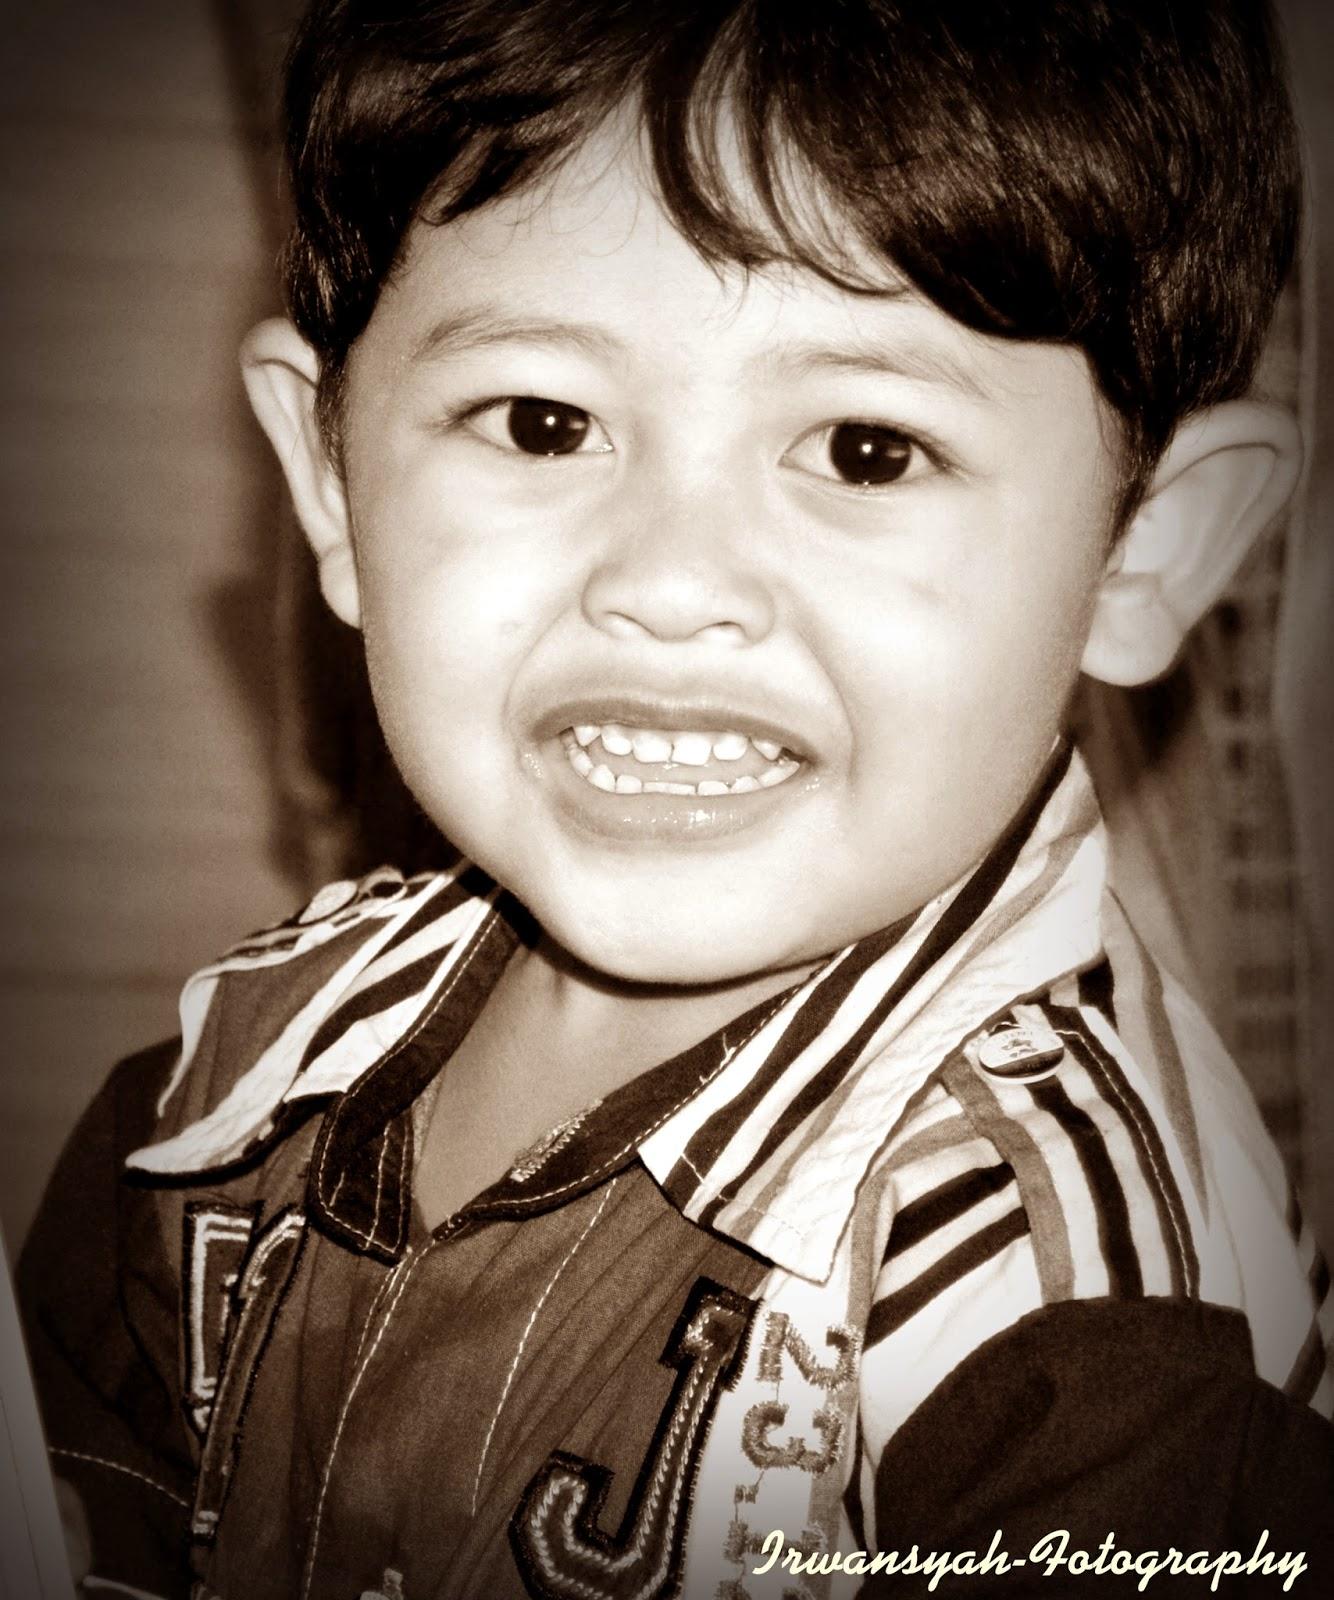 IRWANSYAH PHOTOGRAPHY Anak Kecil Yang Lucu